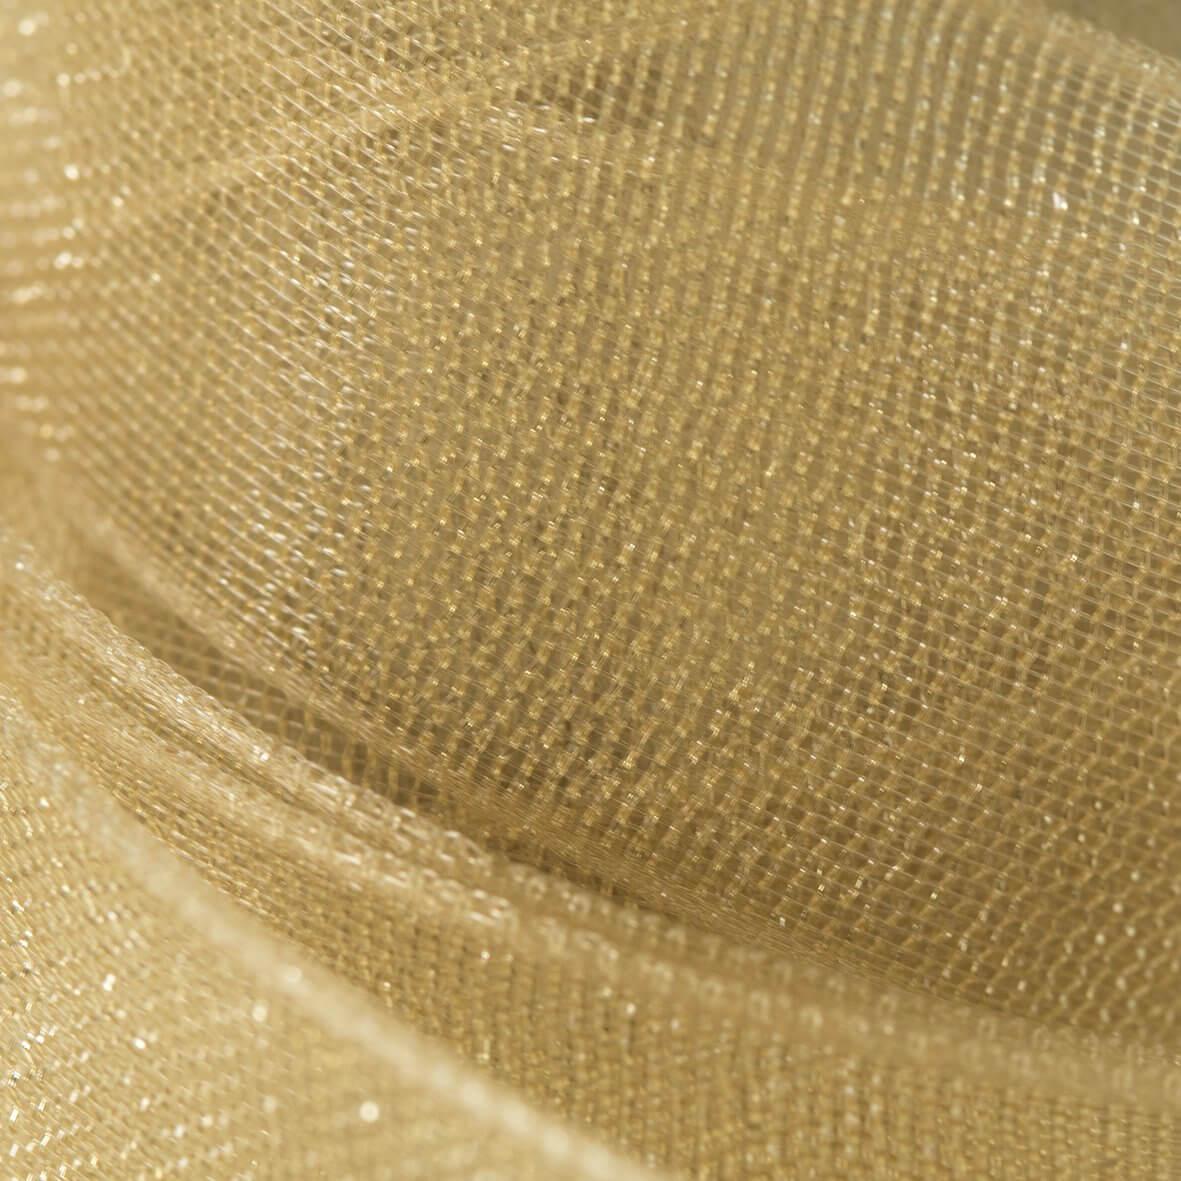 Gold Organza Ribbon 10mm from Club Green - Swatch